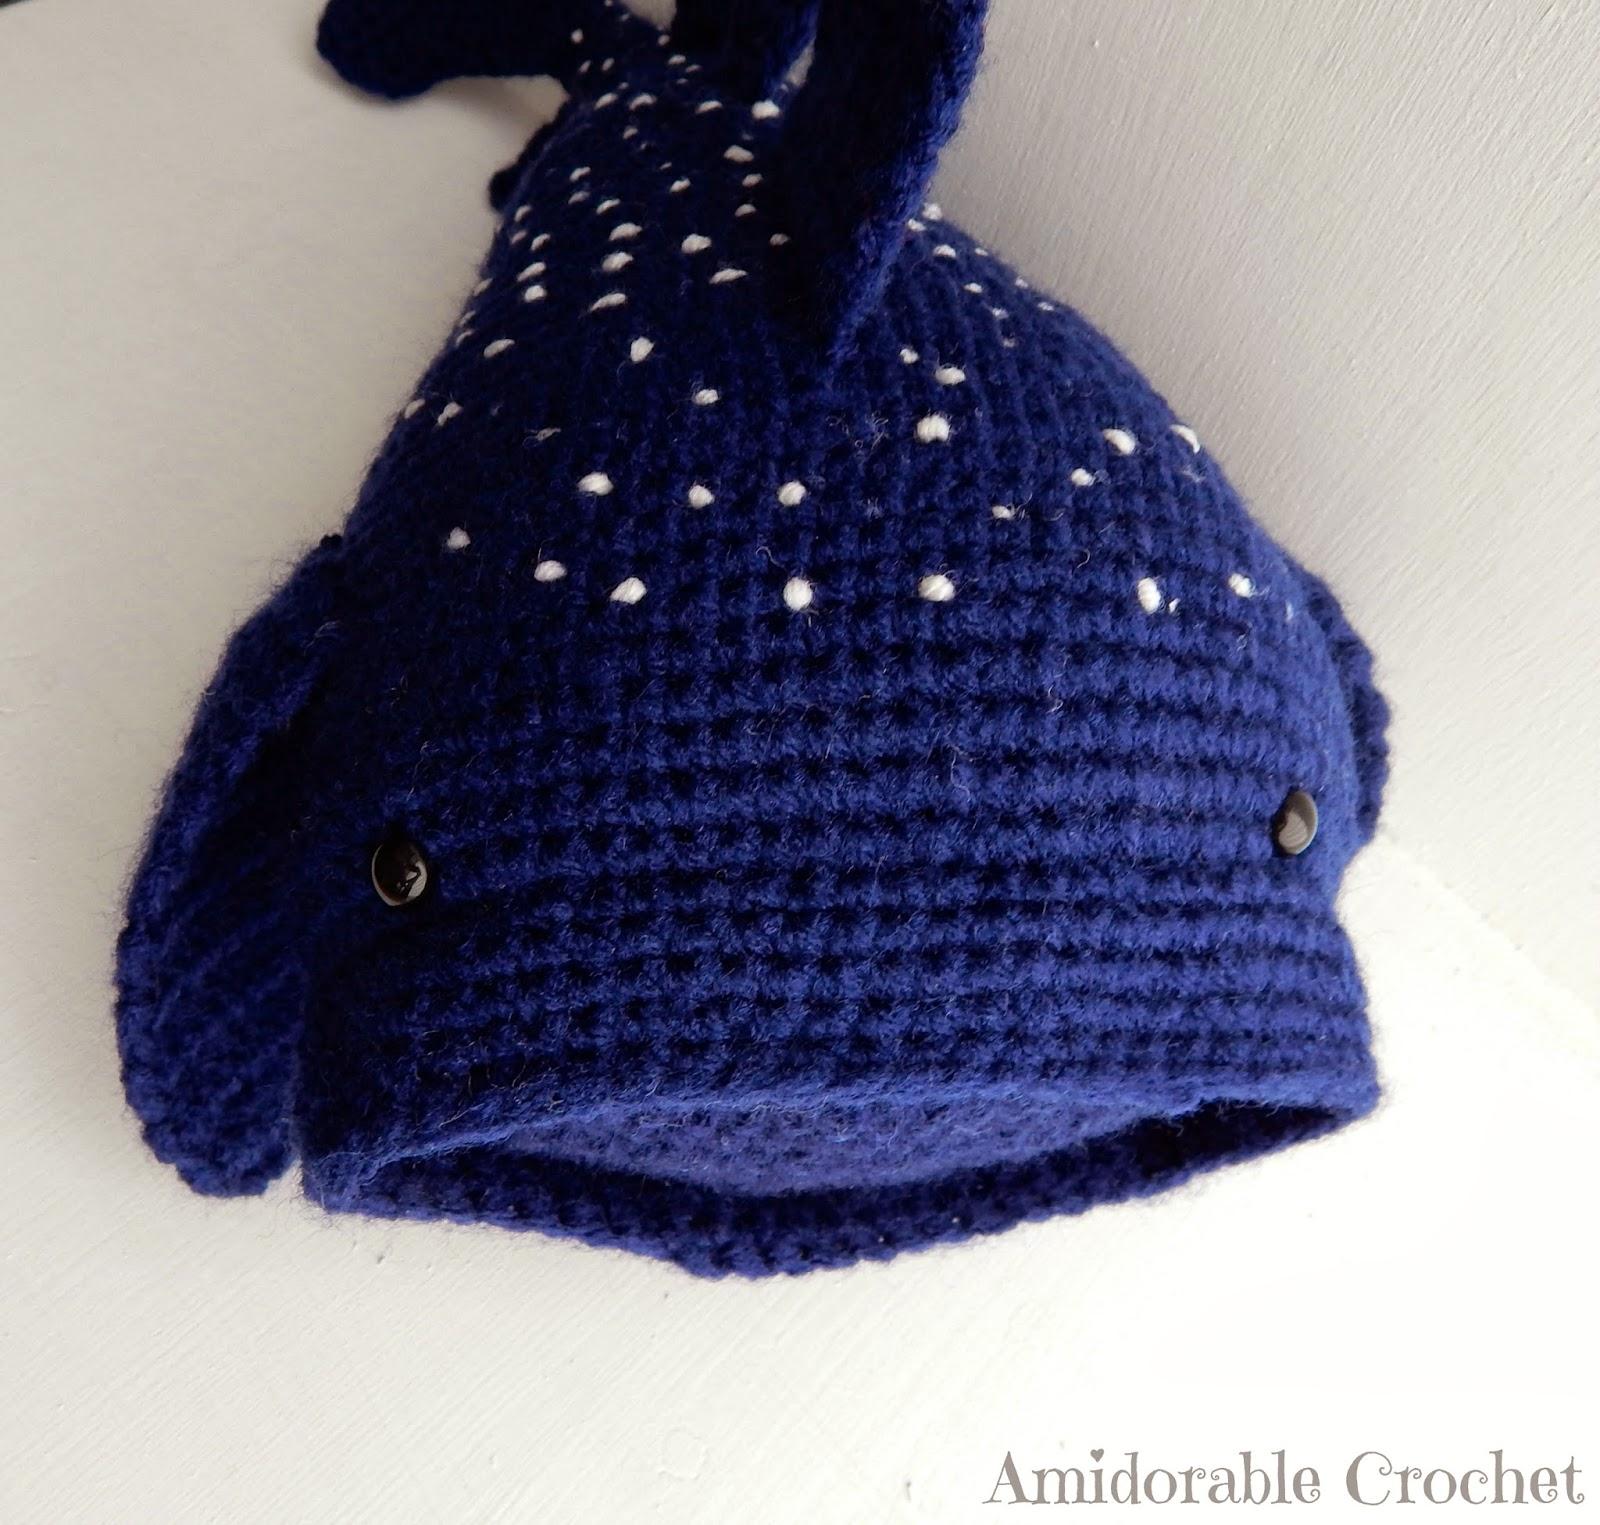 Amazing Amigurumi Shark Crochet Pattern - Crochet News | 1525x1600